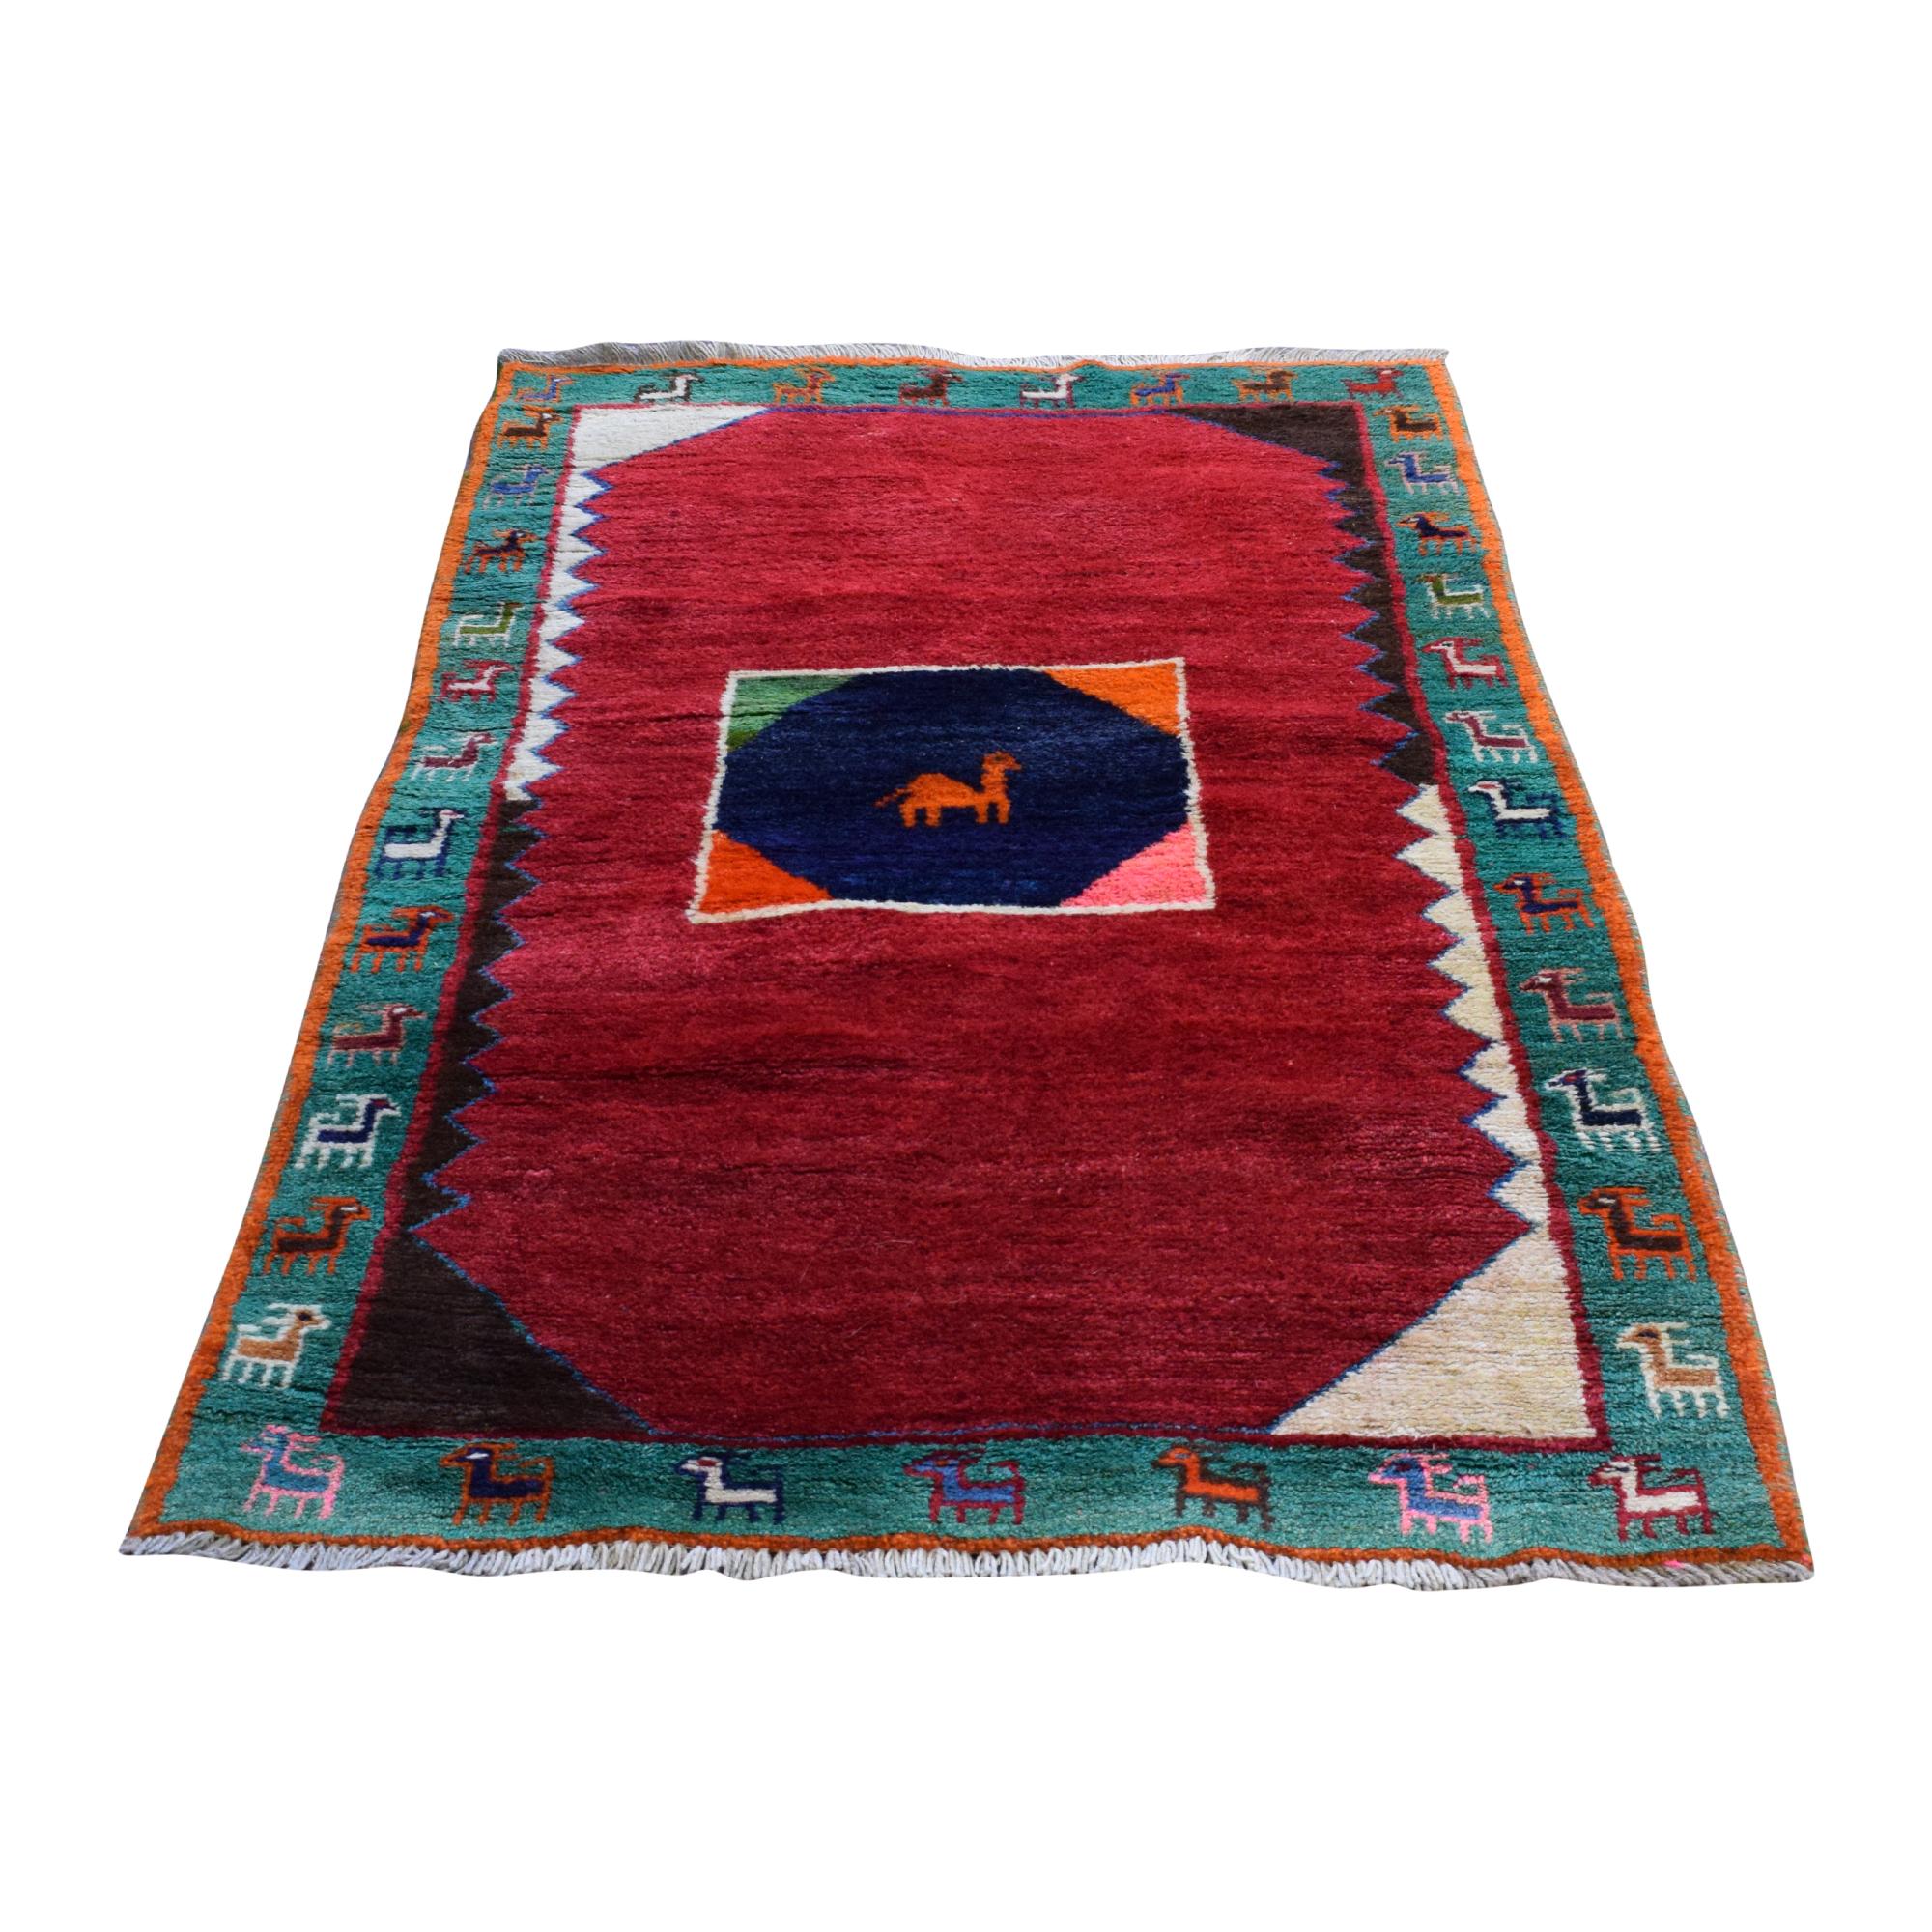 Oriental Wool Carpet